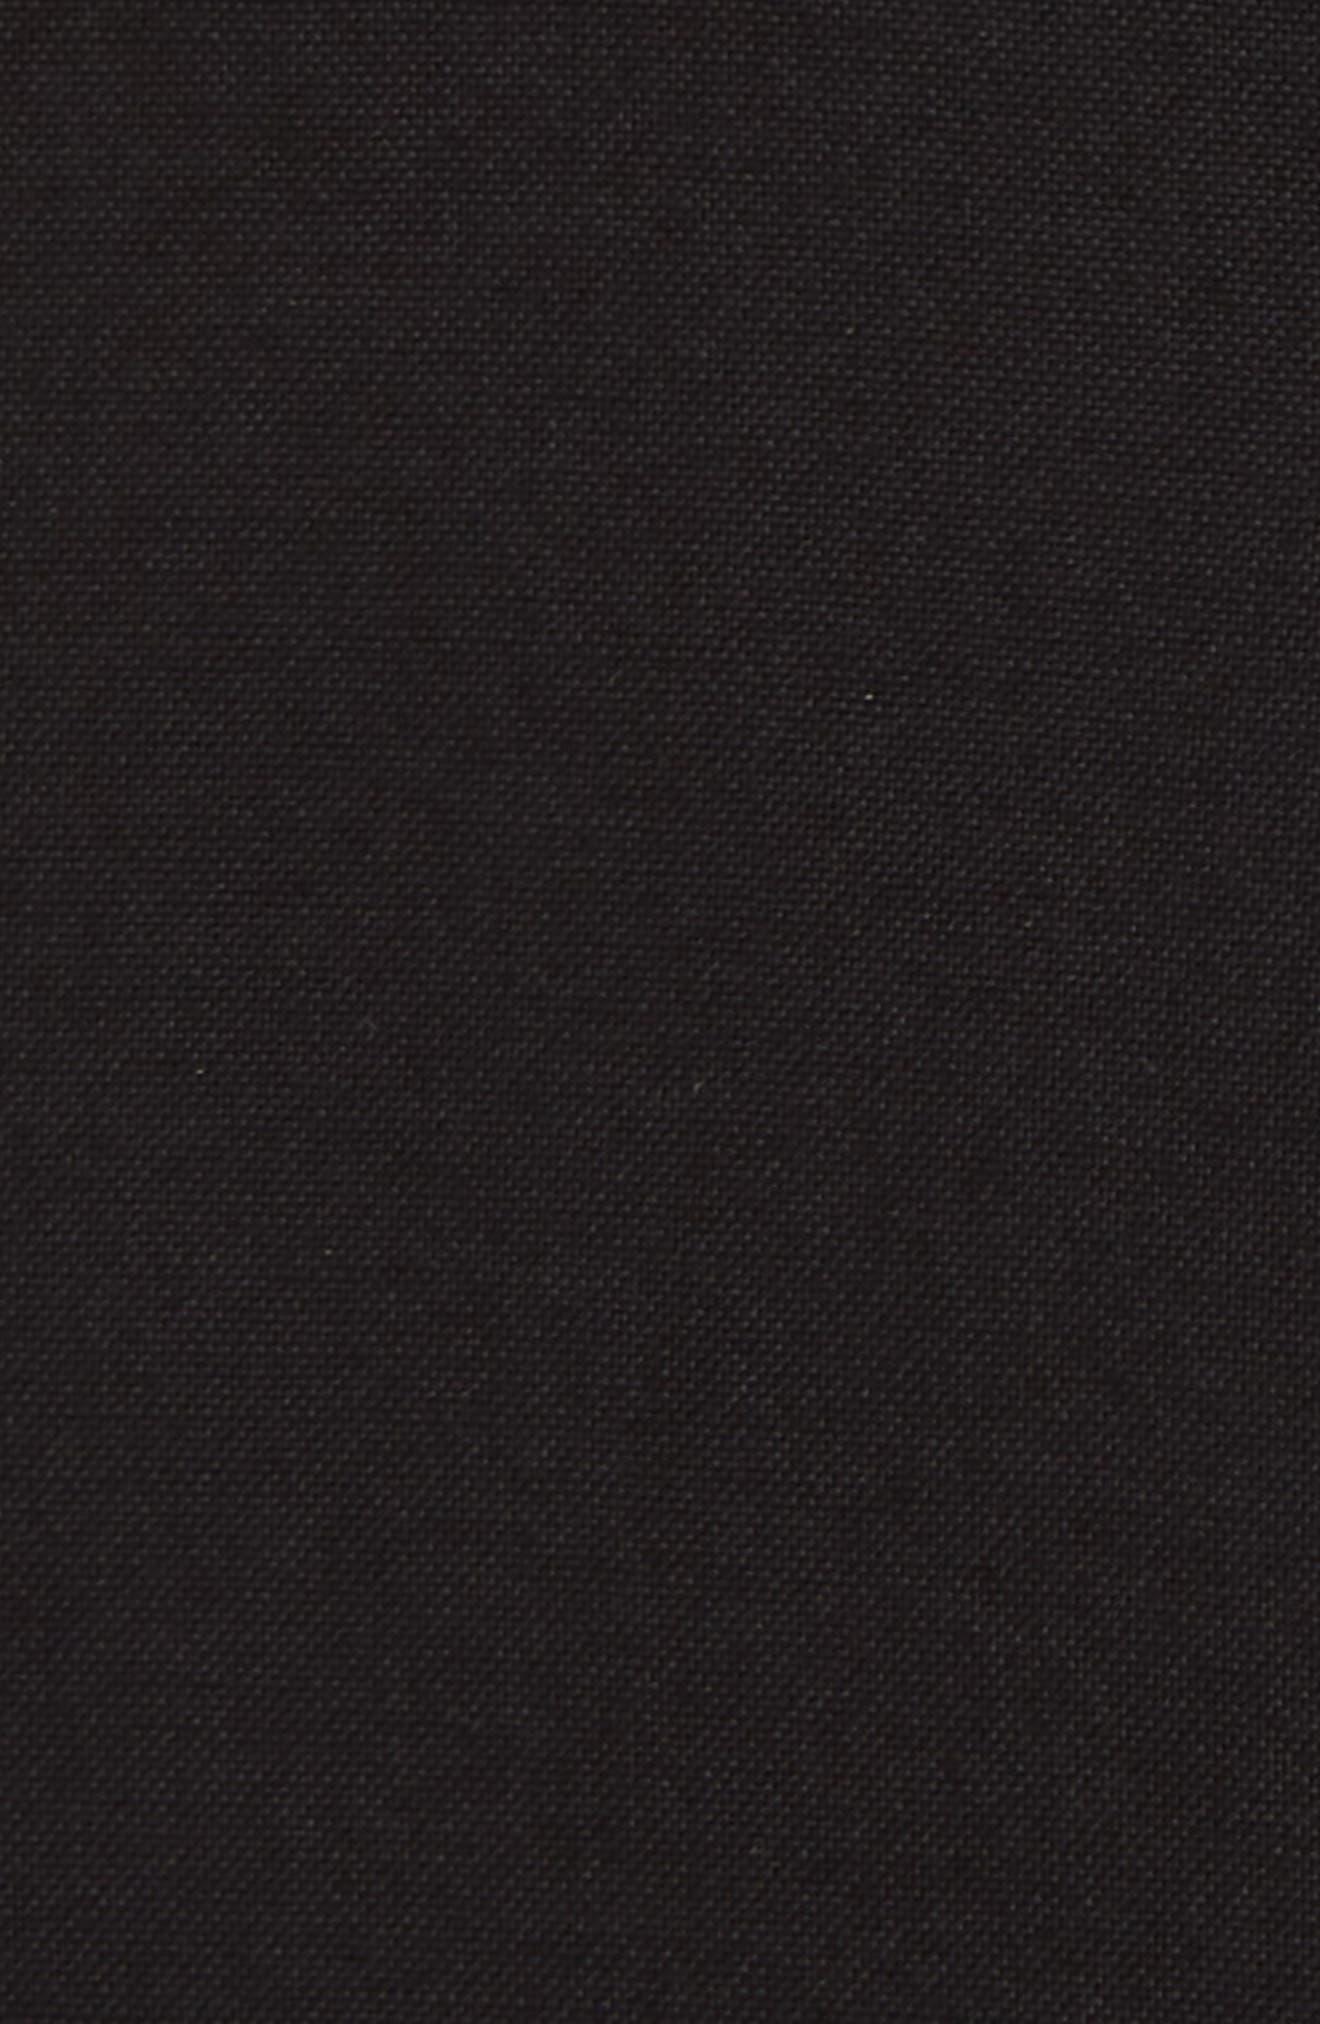 TOPMAN, Band Collar Shirt, Alternate thumbnail 4, color, 001